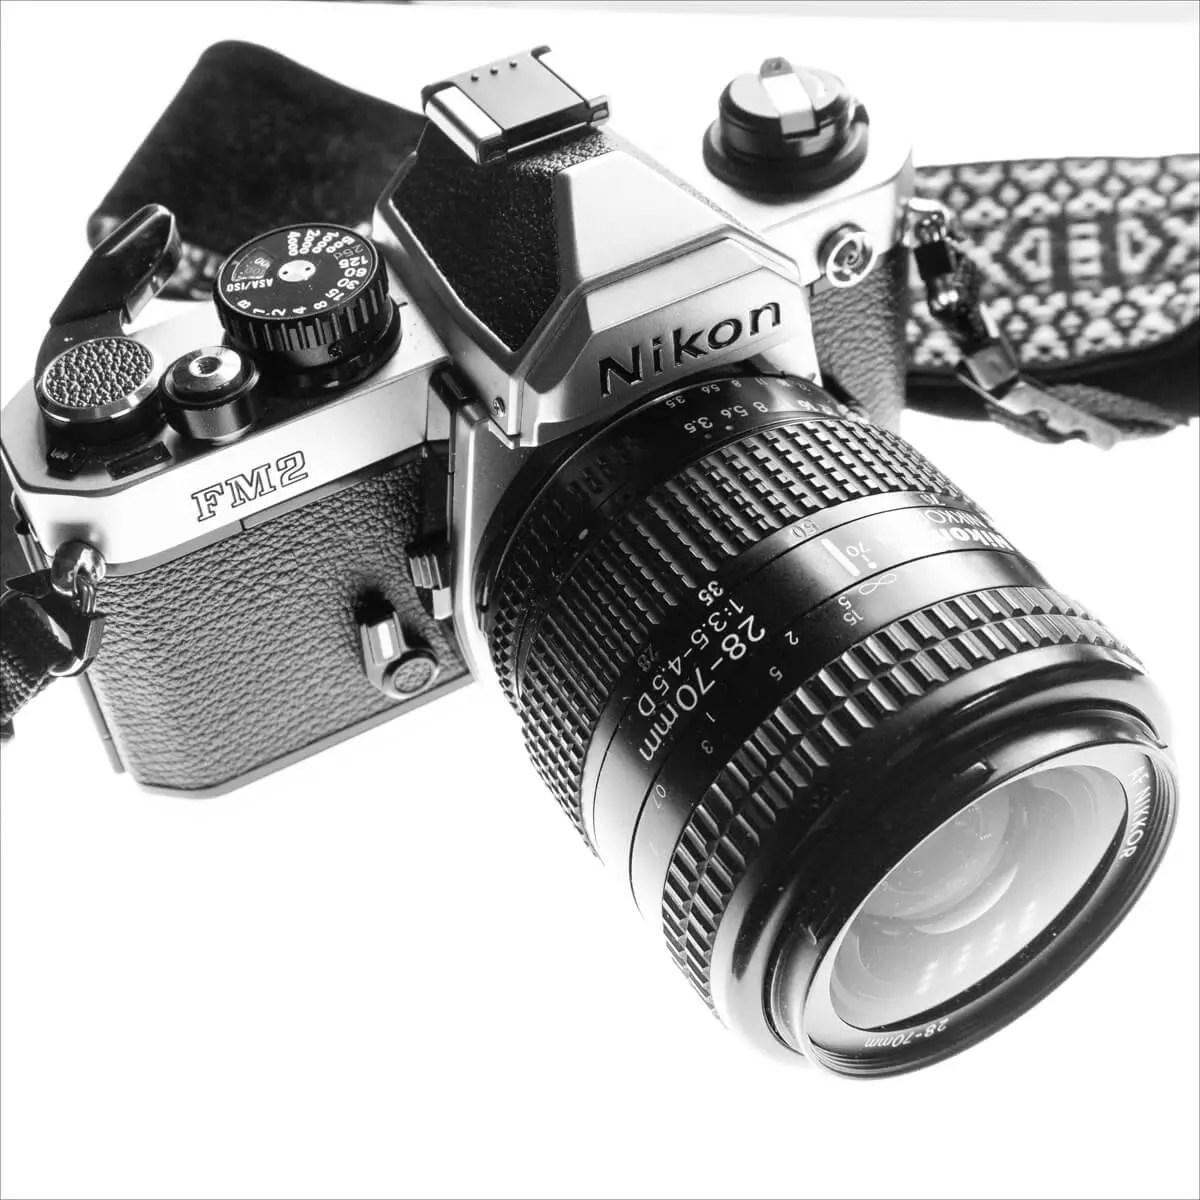 MY Nikon FM2n and Nikkor AF 28-70mm f:3.5-4.5D, David Whenham